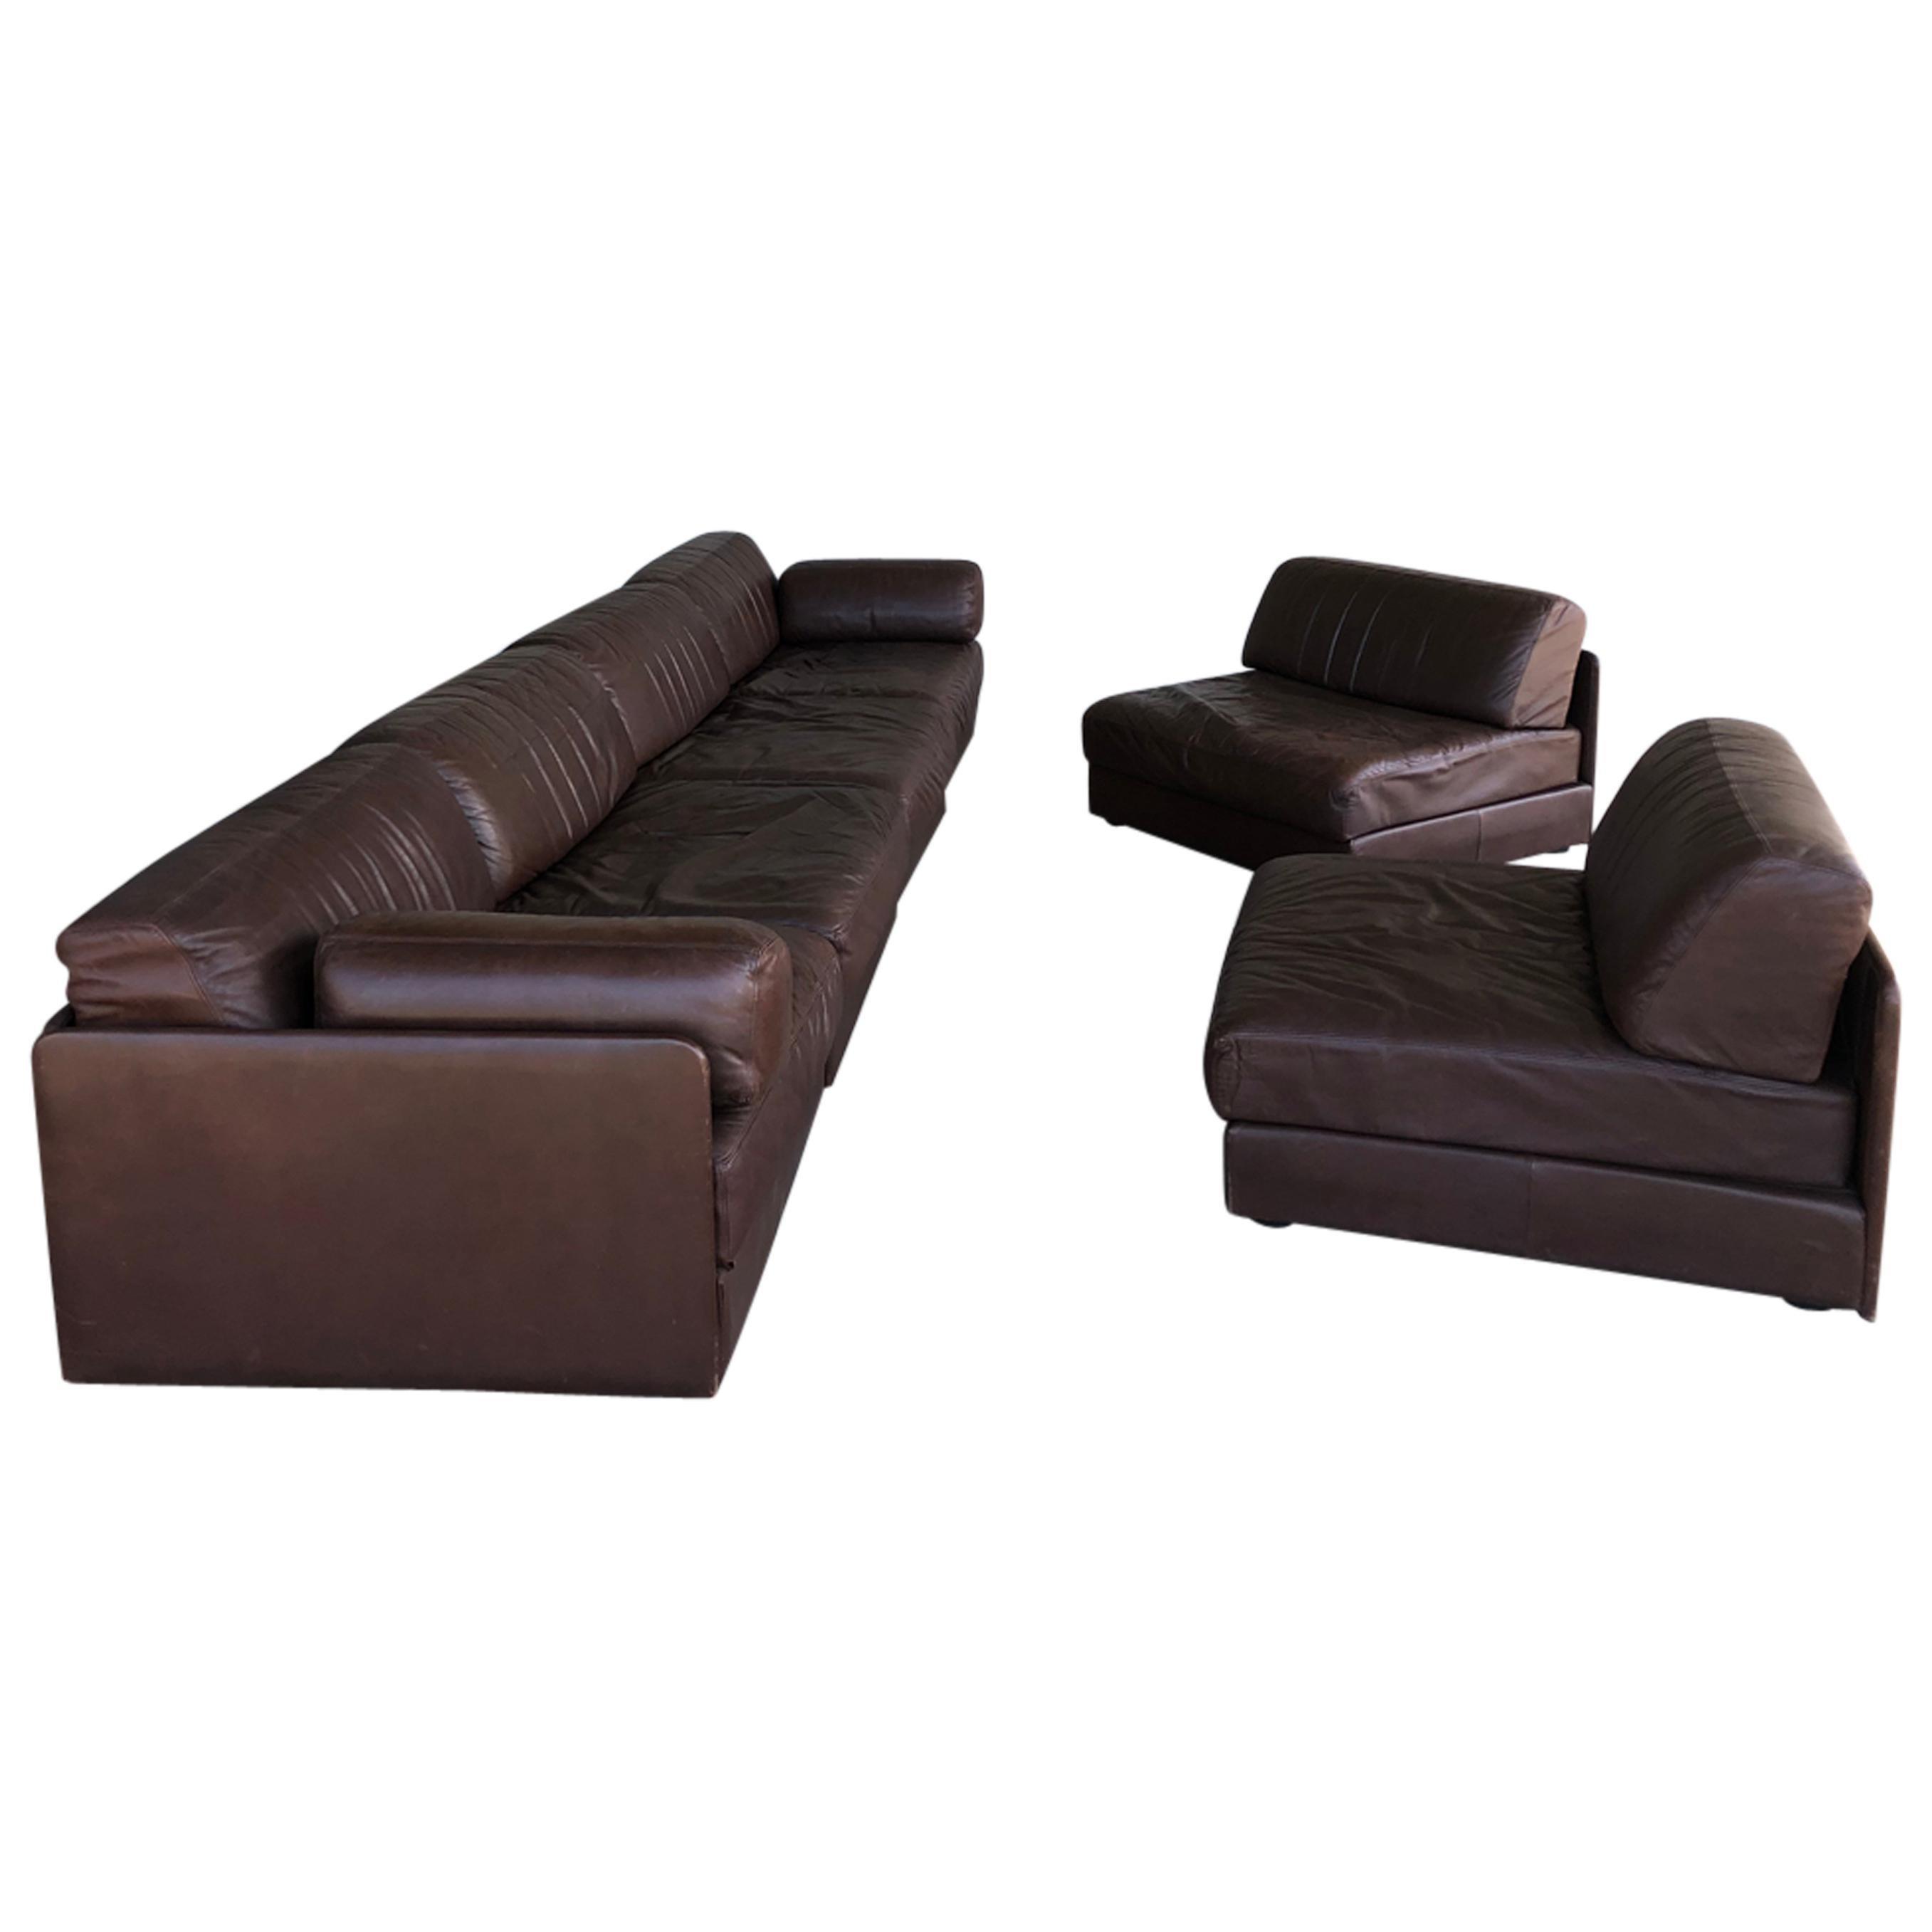 1970s Brown Leather Sofart DS Modular Sofa